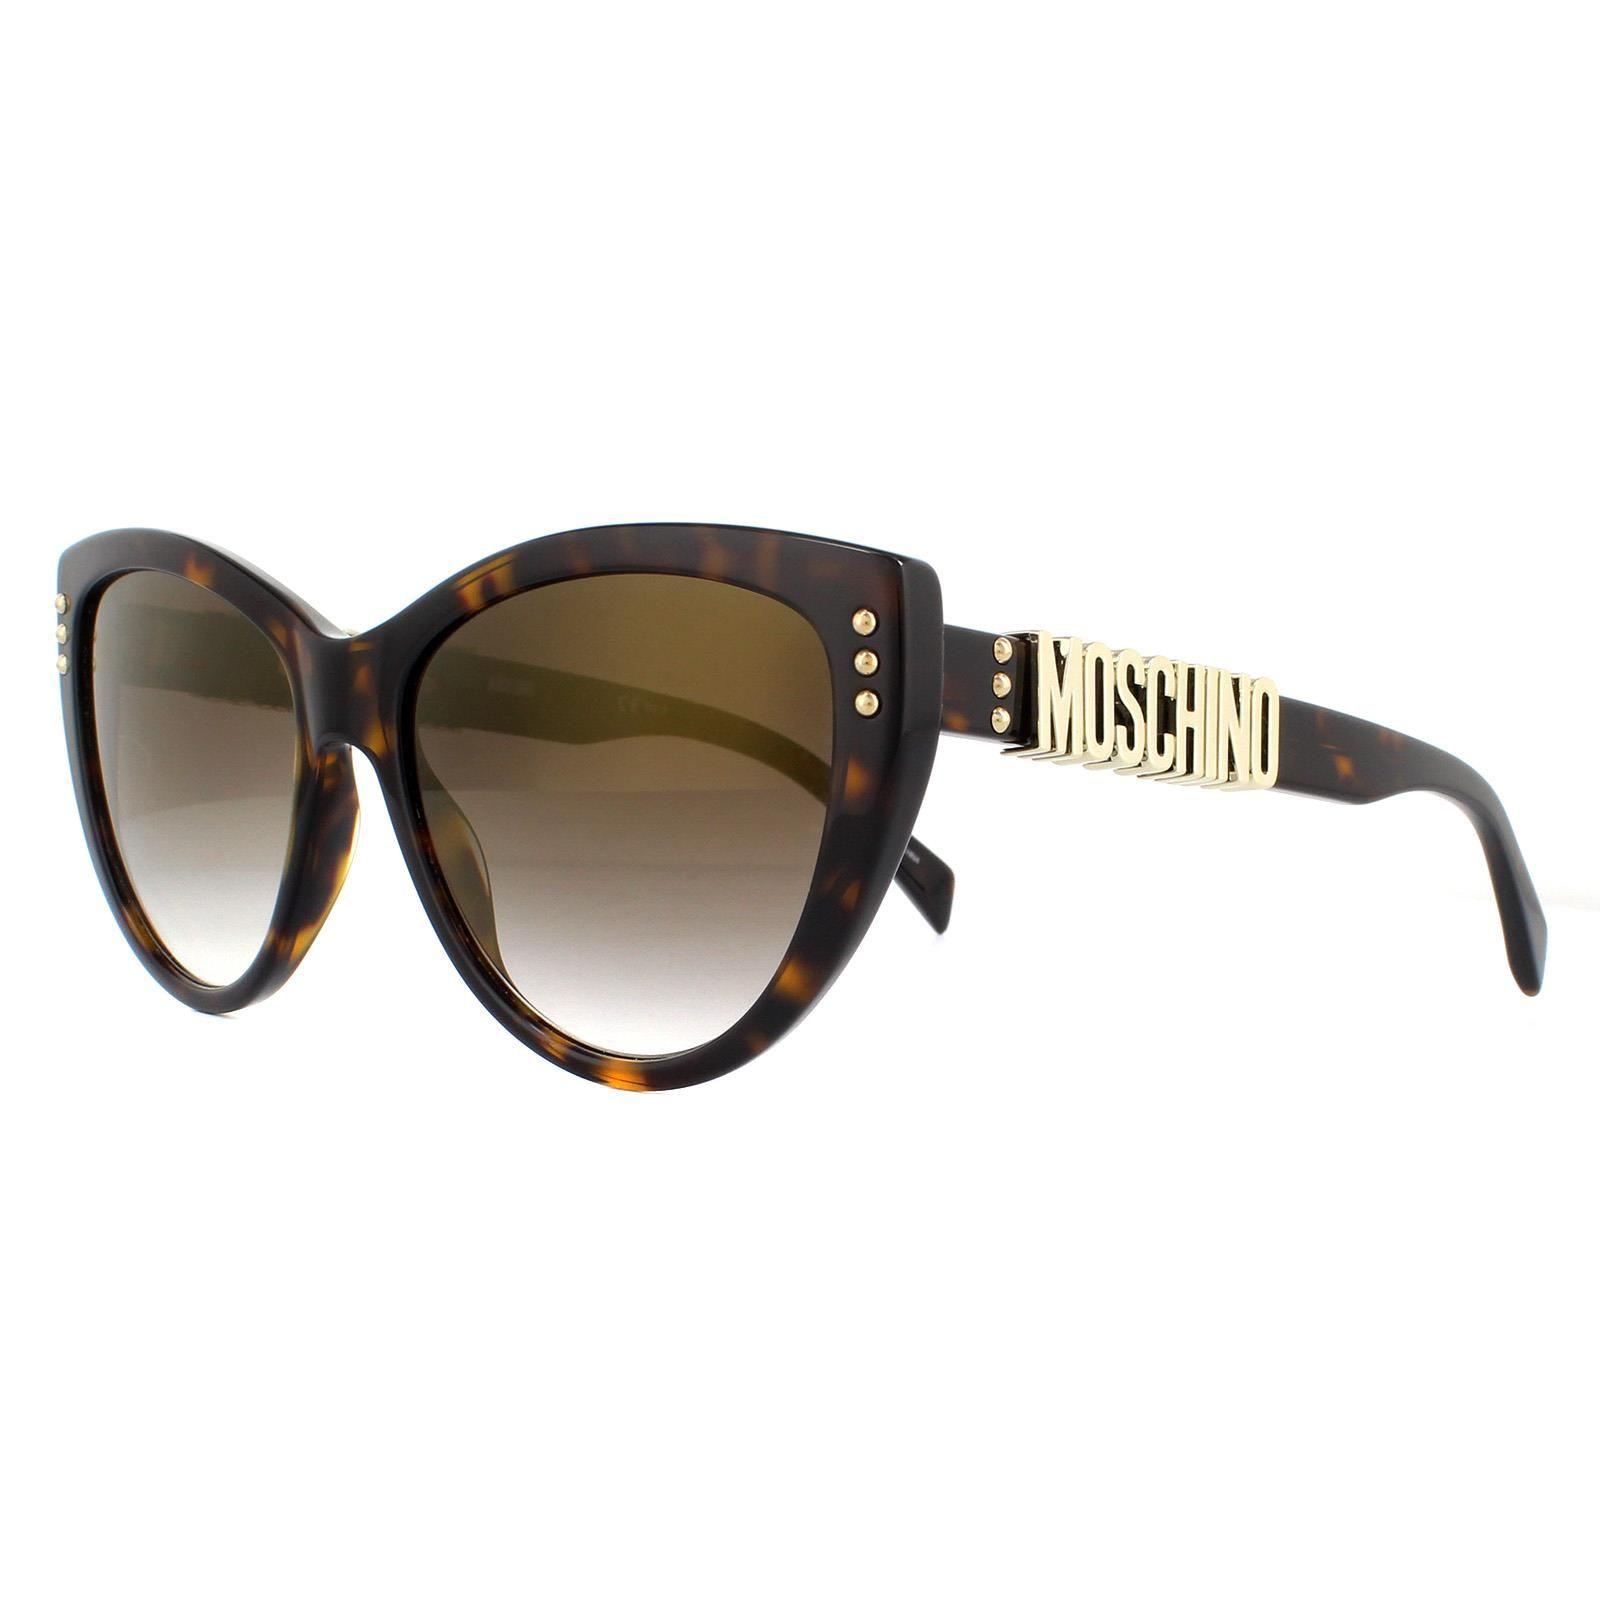 Moschino Sunglasses MOS018/S 086 JL Dark Havana Brown Gold Mirror